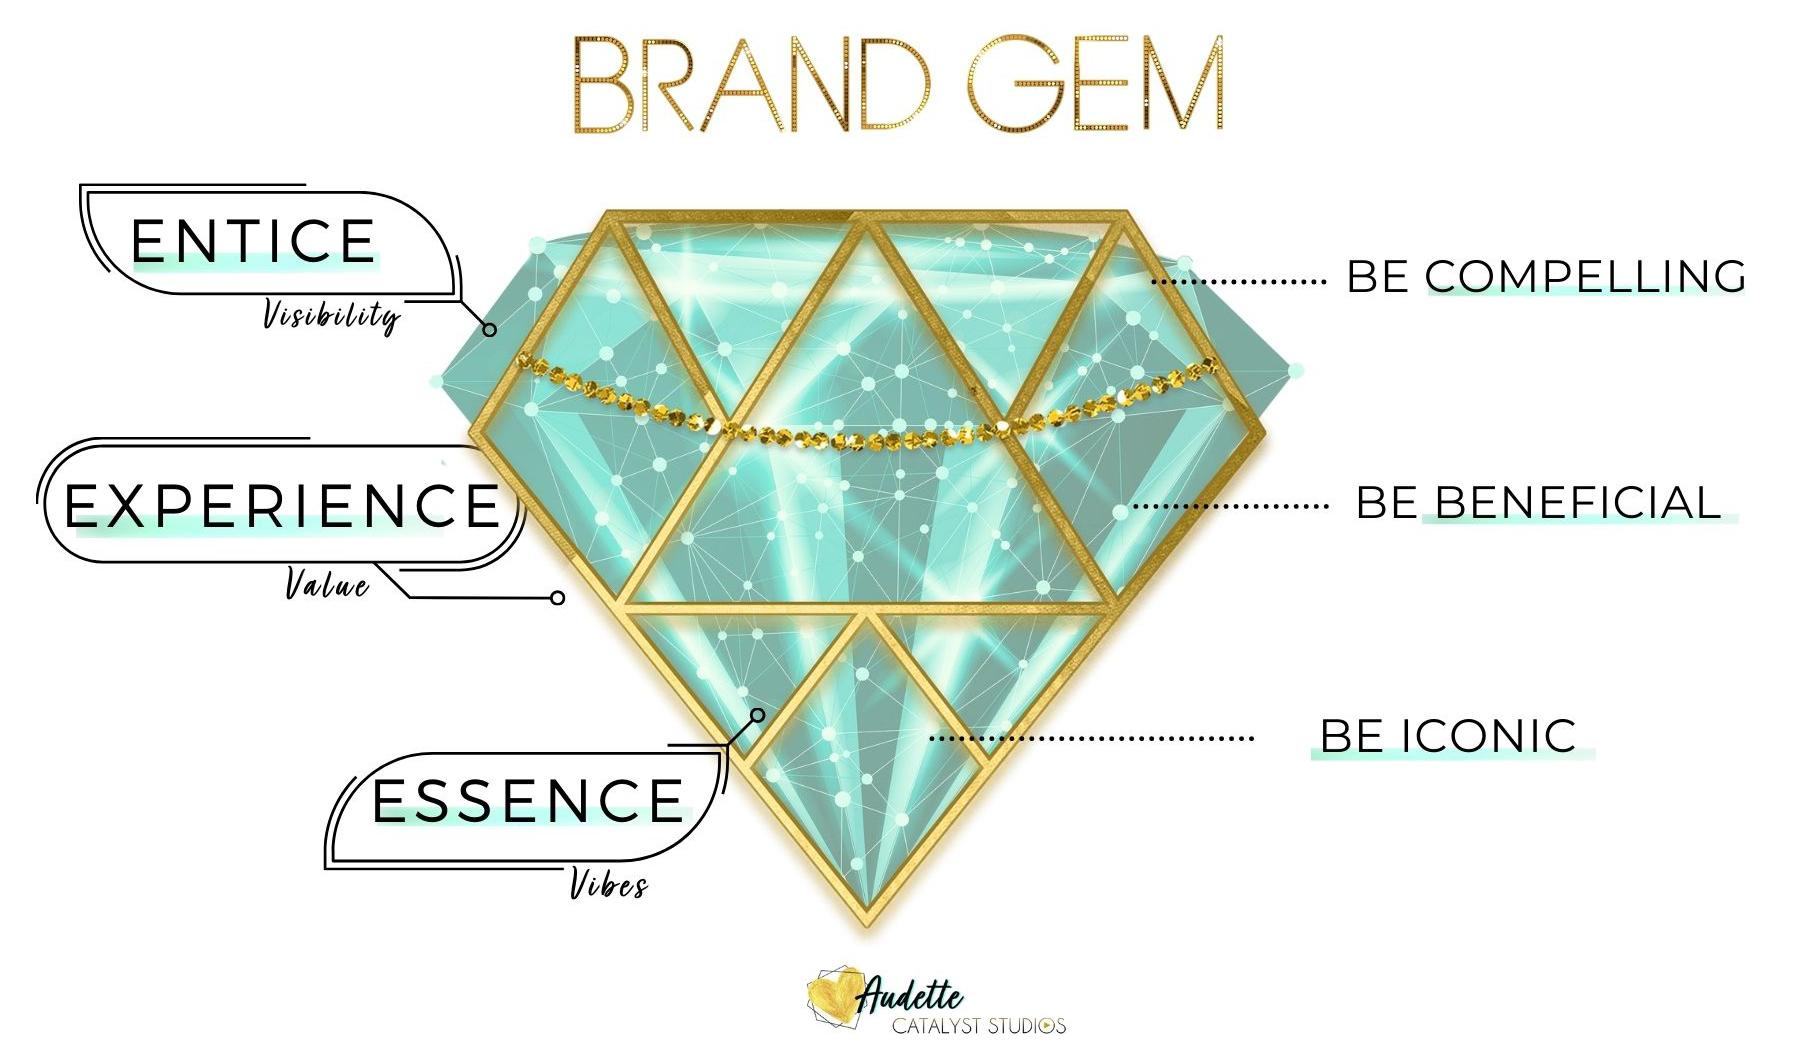 Brand Gem - experiential brand marketing framework by Audette of Catalyst Studios